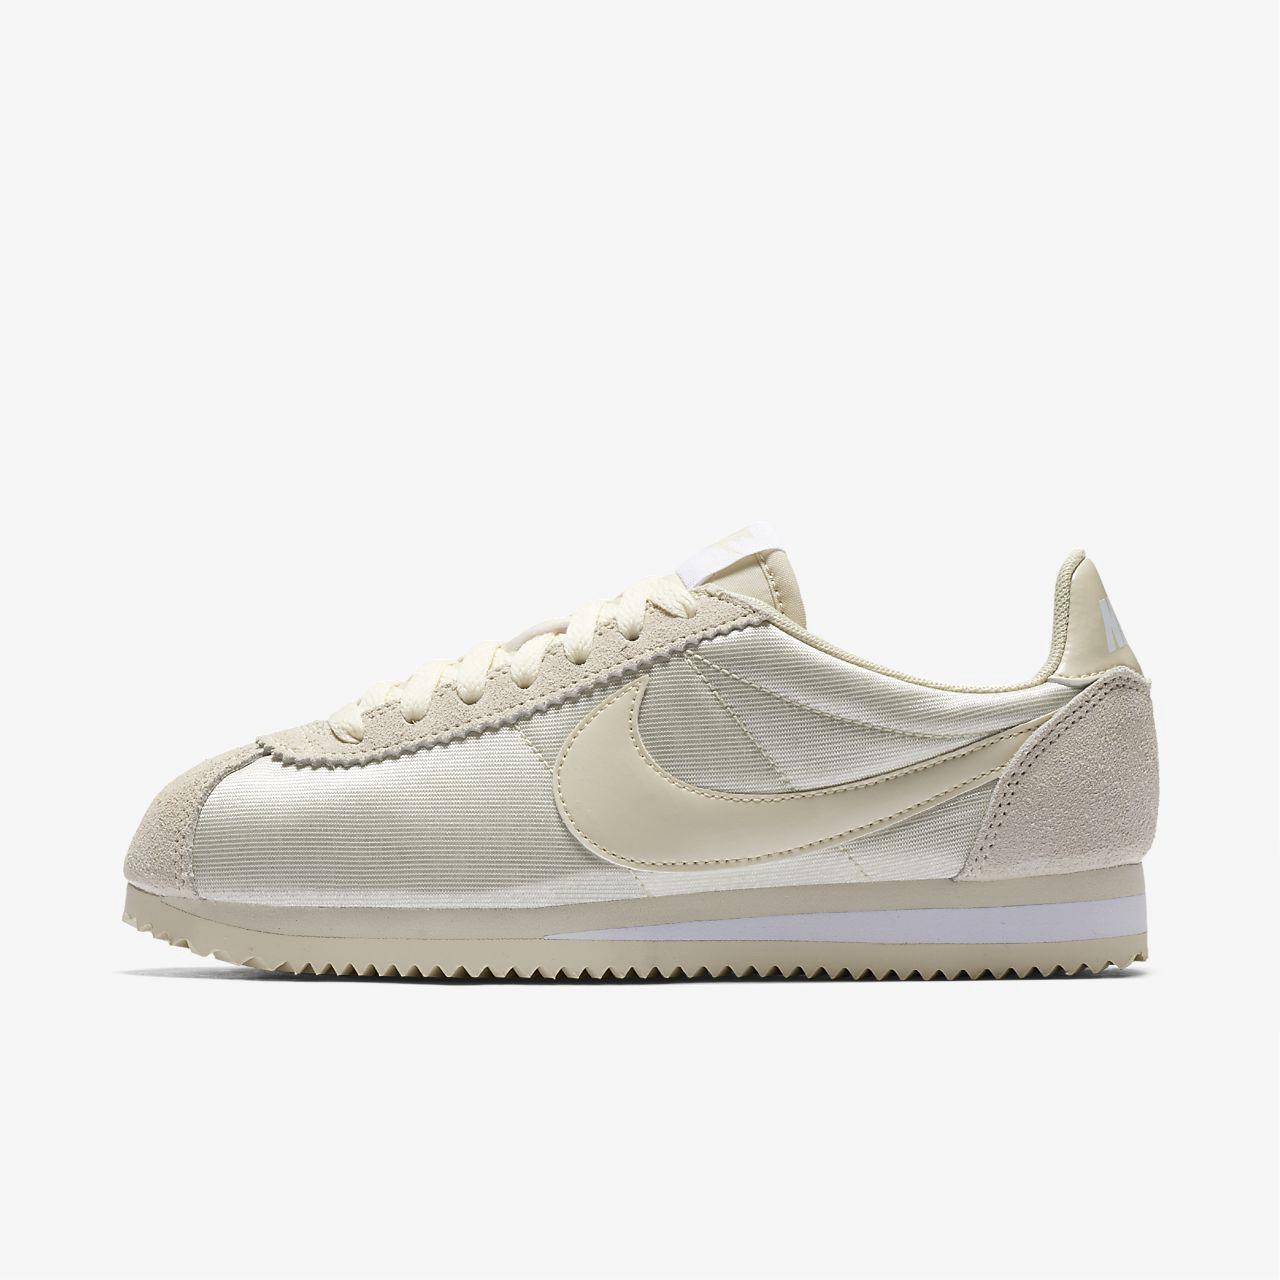 premium selection 95fd7 87f7c Nike Classic Cortez Nylon Womens Shoe - 10.5